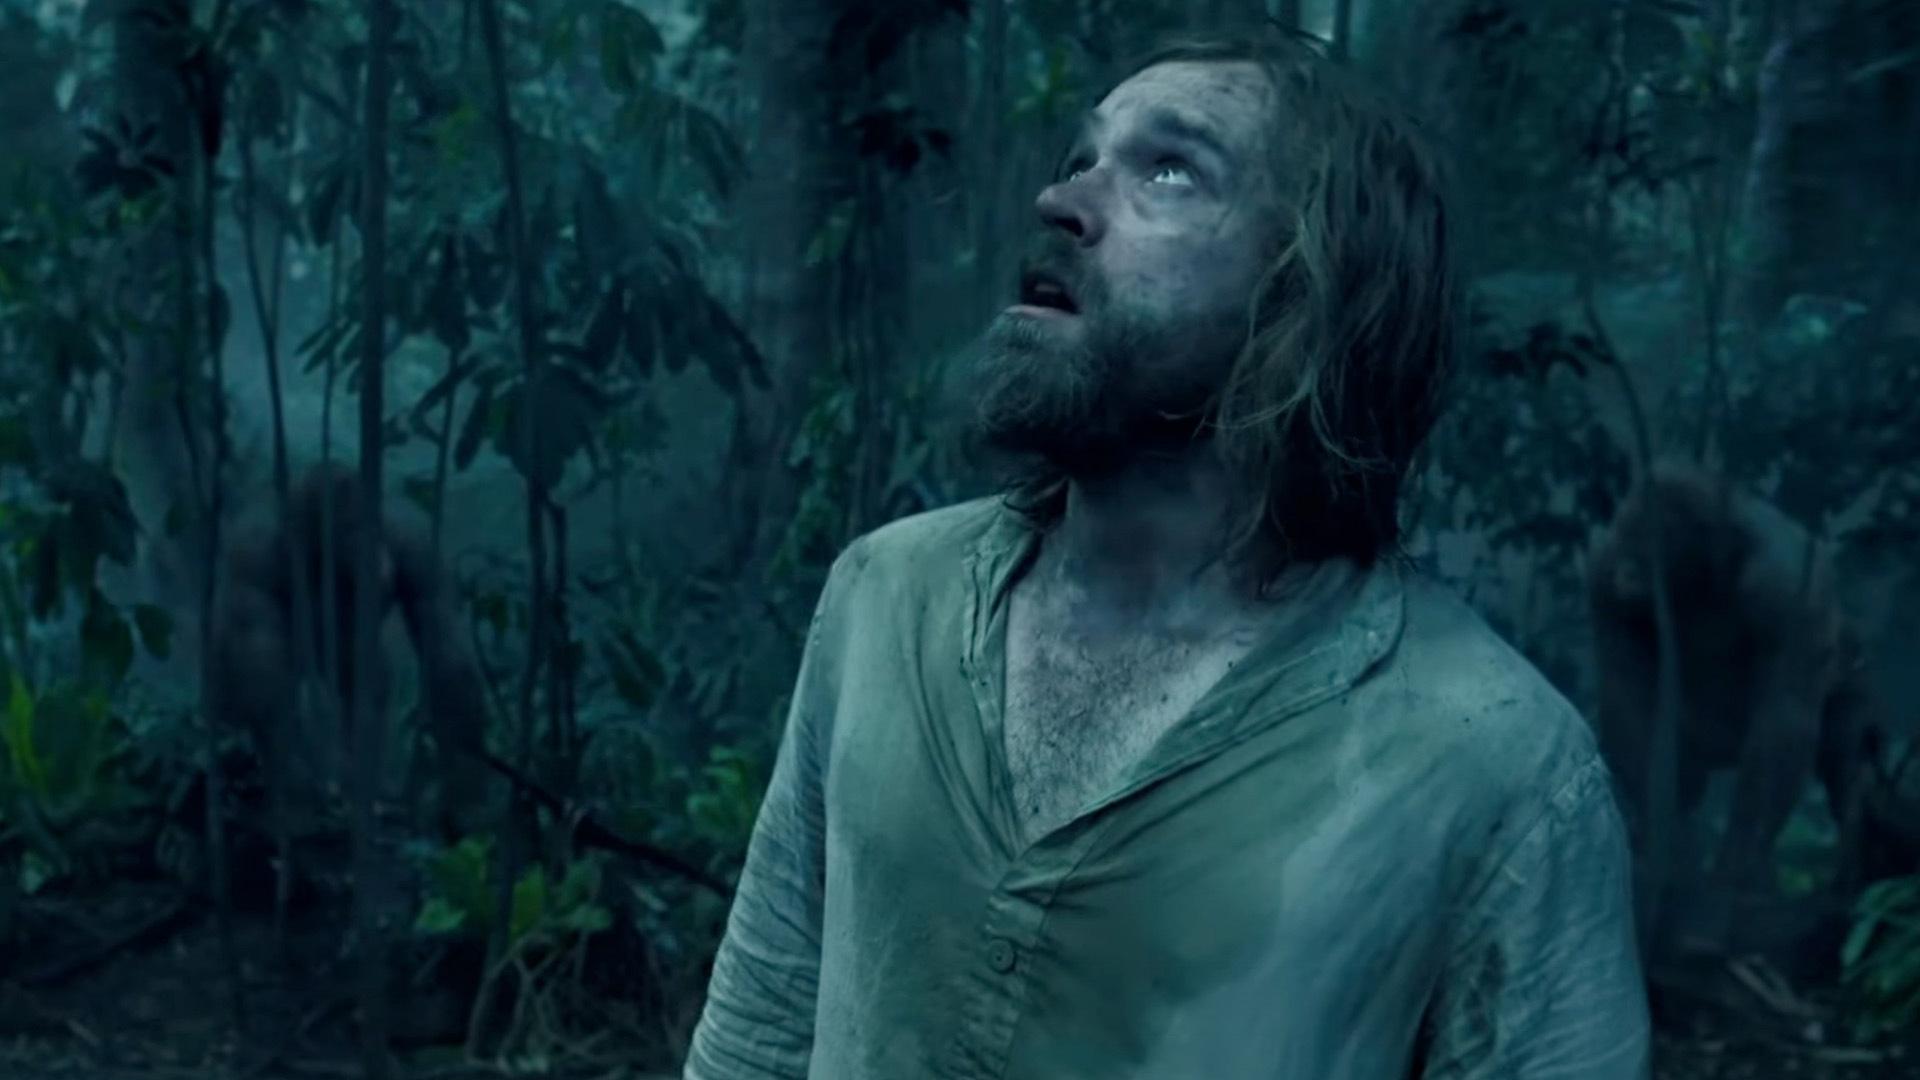 Trailer - The Legend of Tarzan